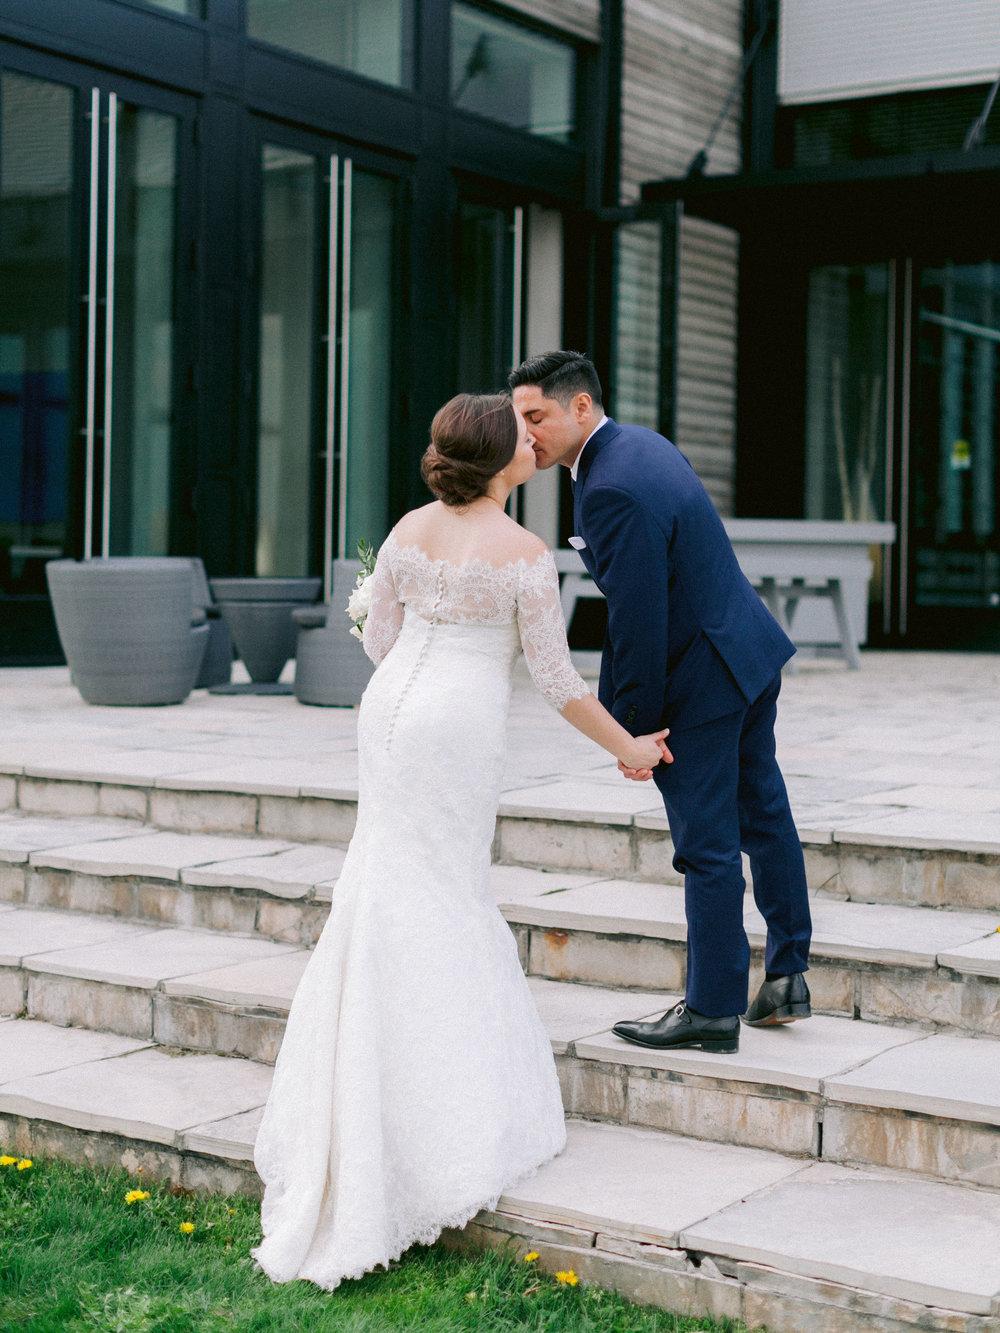 Niagara_on_the_lake_spring_wedding_kurtz_orpia_toronto_Vineyard_wedding_fine_art (71 of 92).jpg